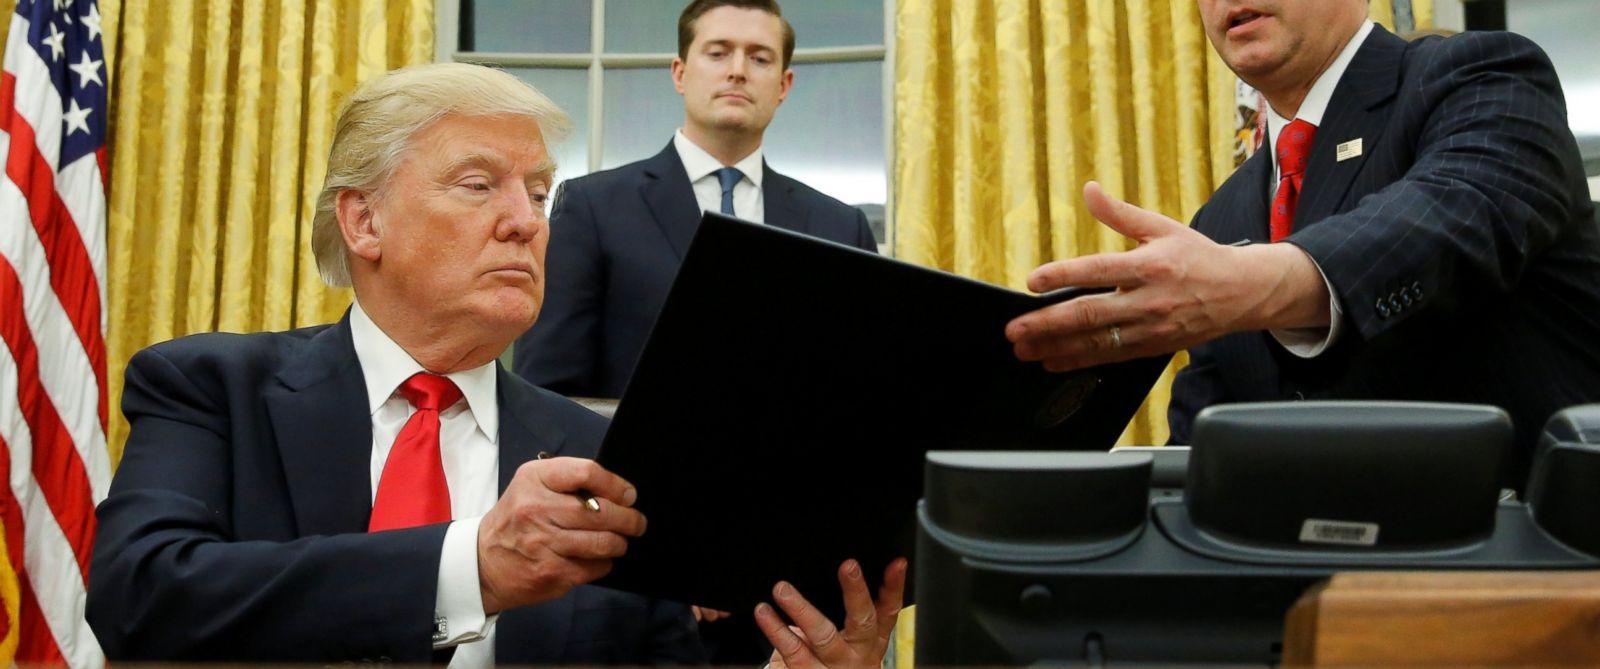 Trump is Sending Congress to Space